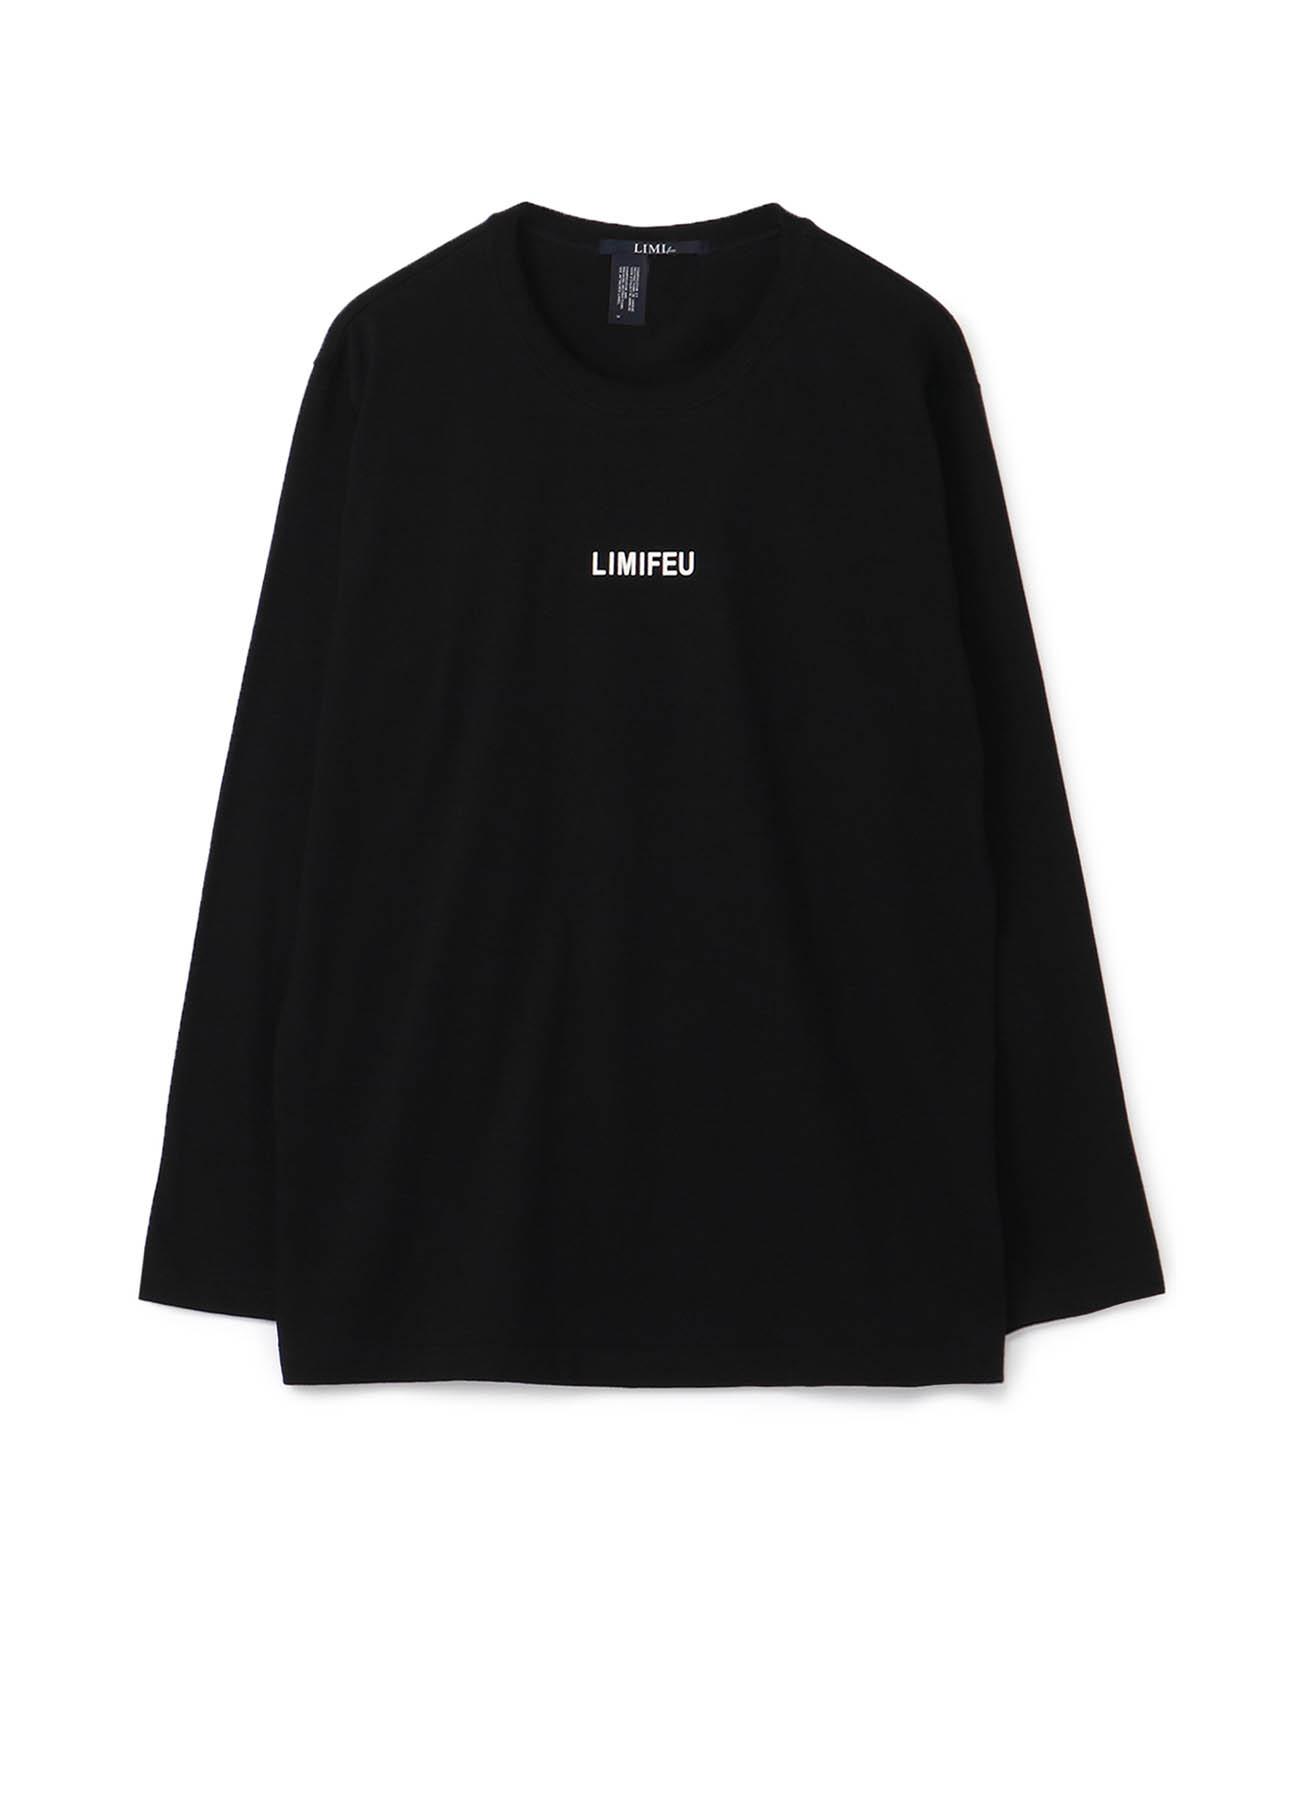 20/-Plain Stitch LIMI FEU Logo Print Long T-Shirt